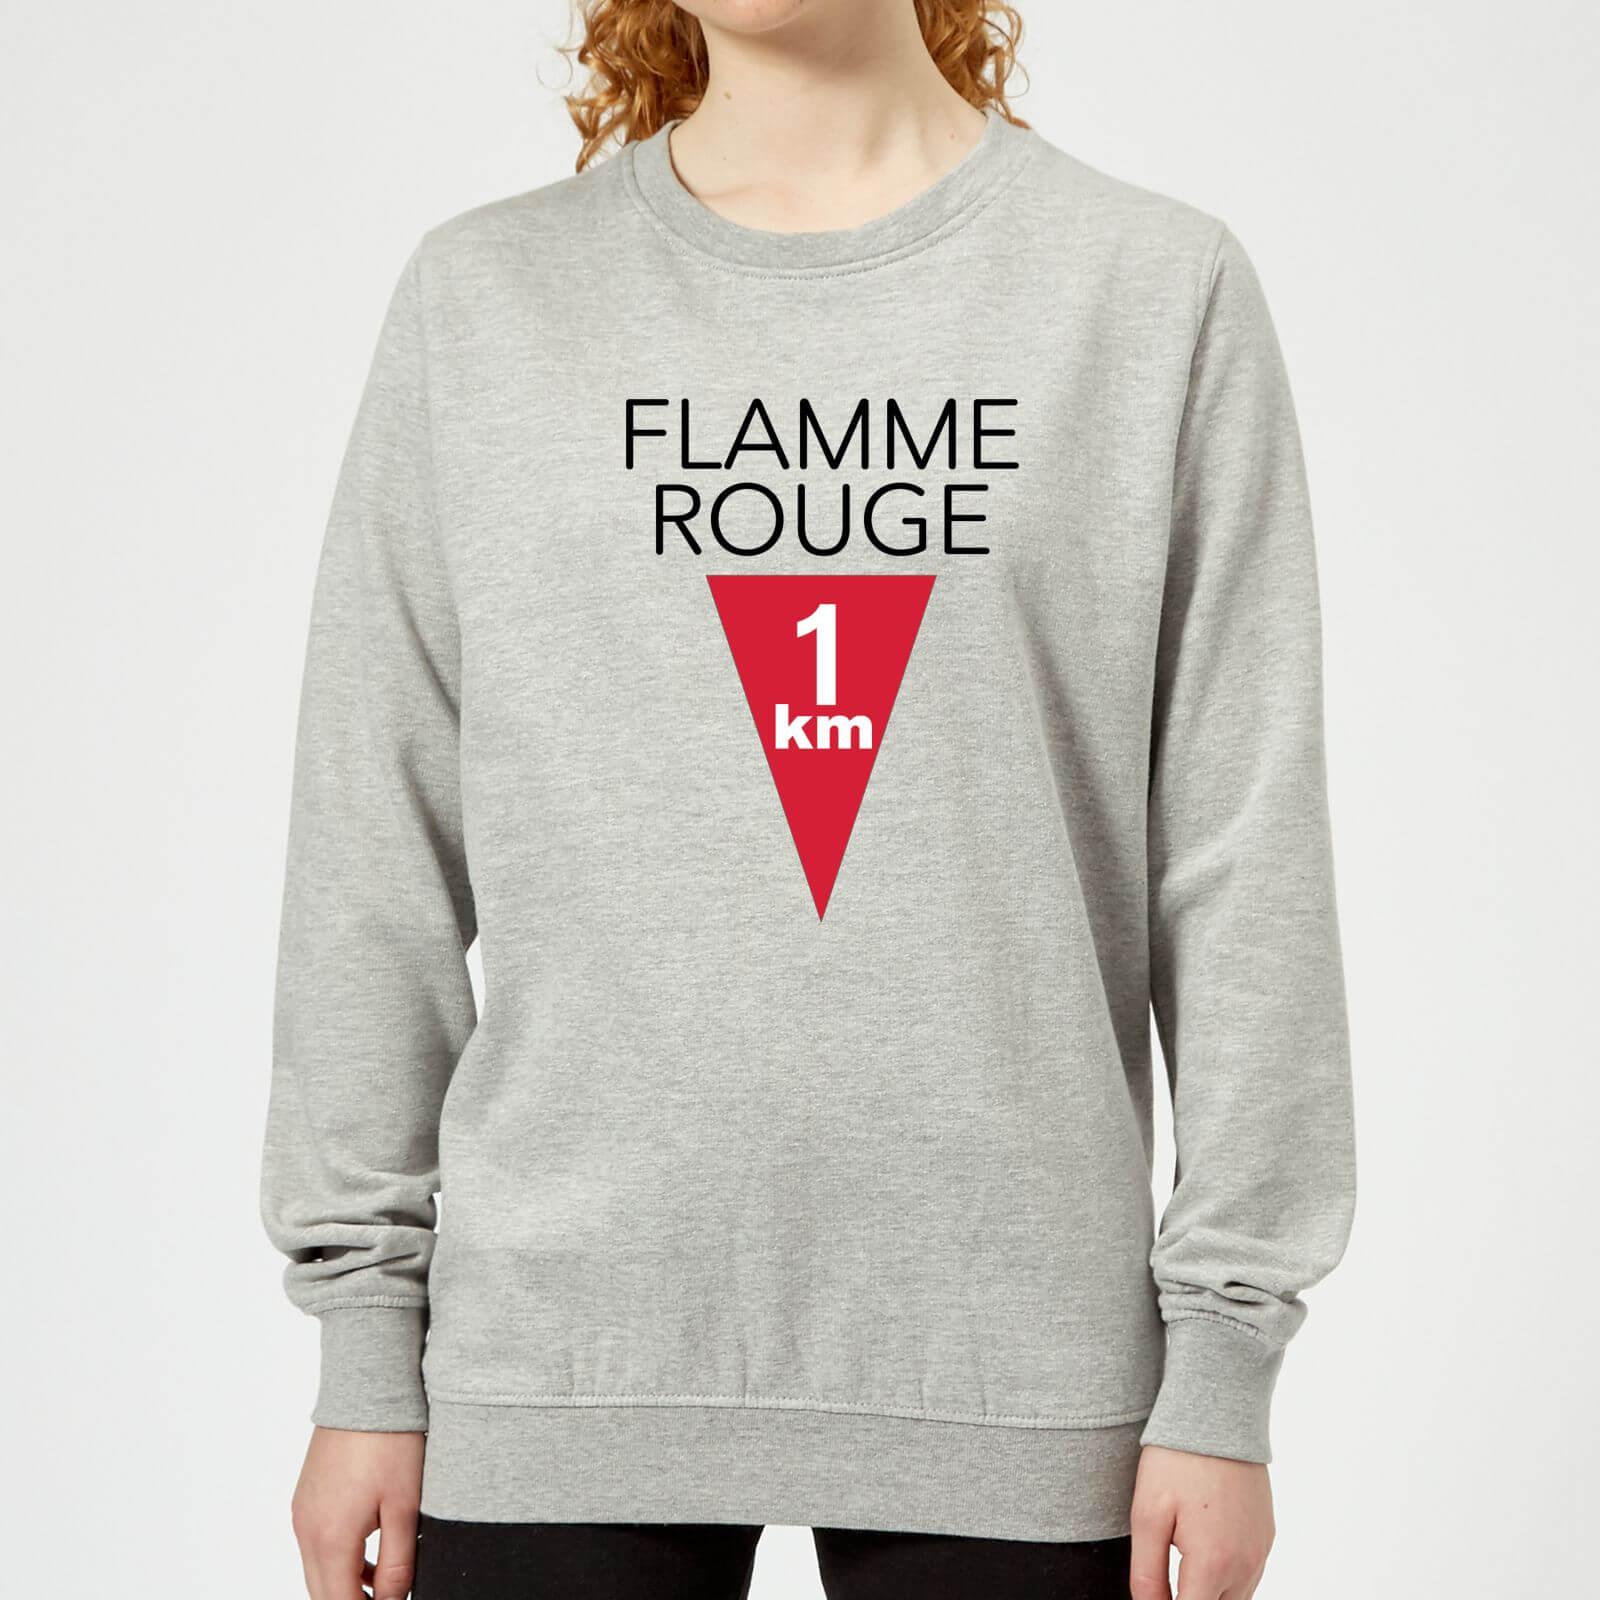 Summit Finish Flamme Rouge Women's Sweatshirt - Grey - L - Grey